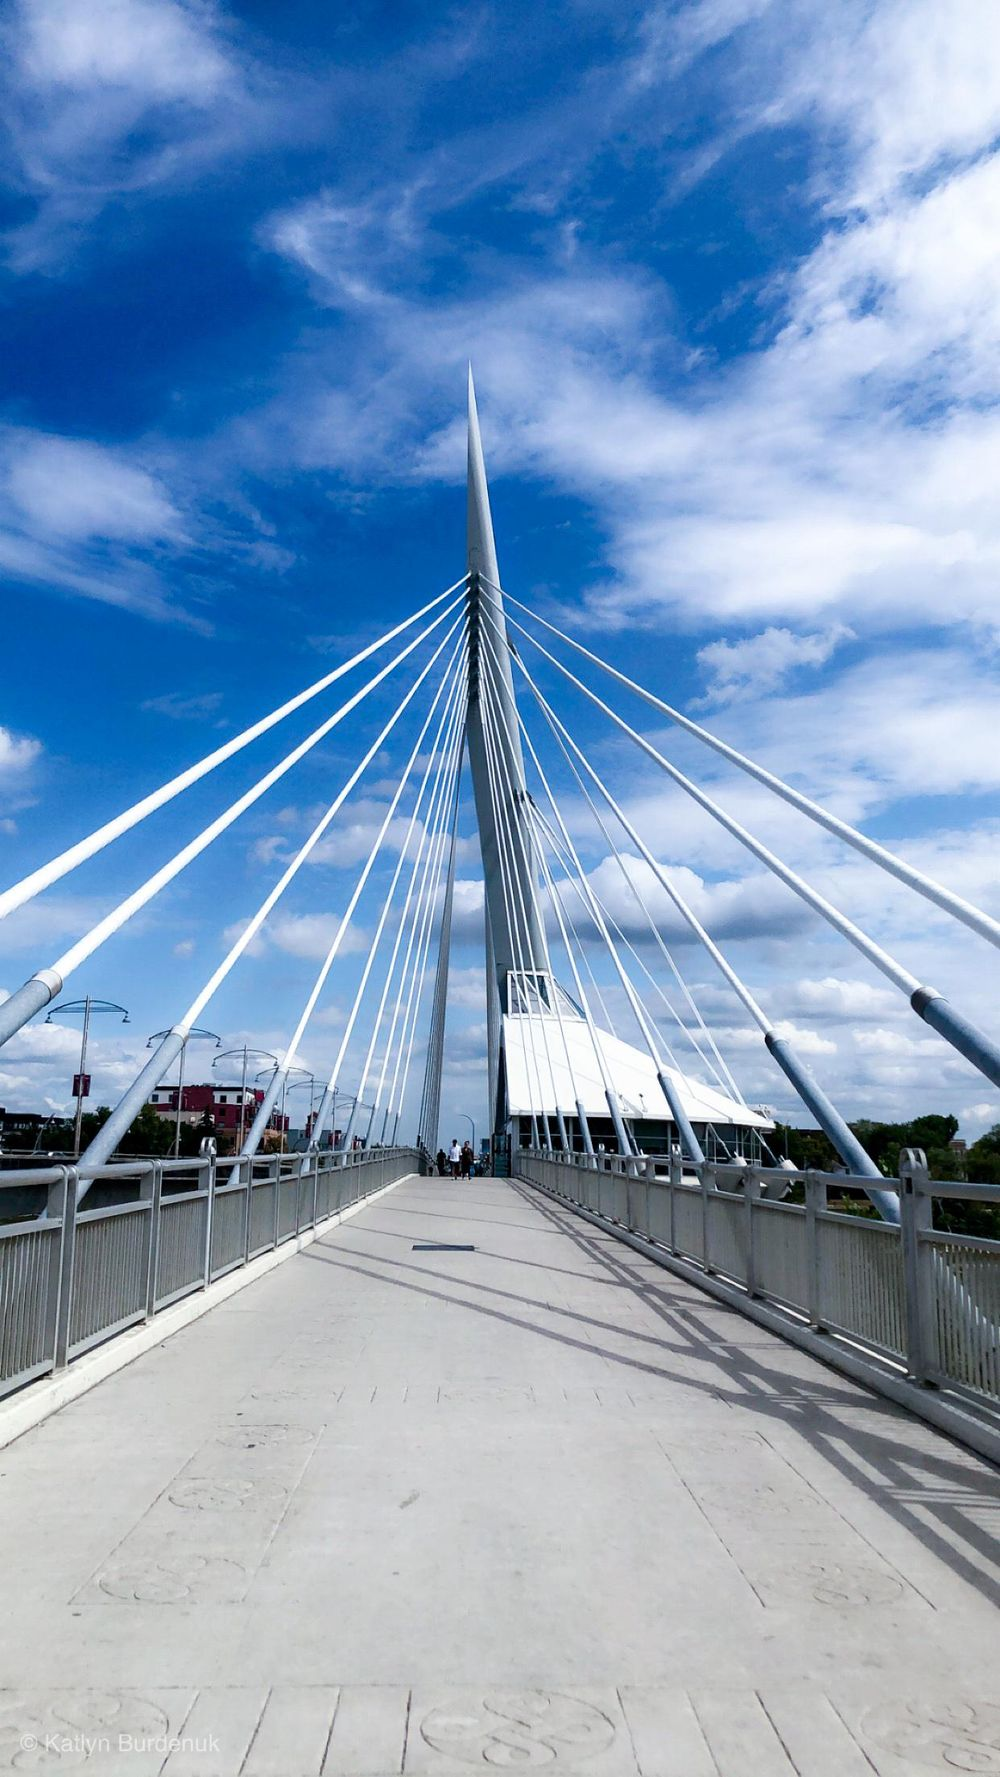 Provencher Bridge - Winnipeg Manitoba - image 1 - student project